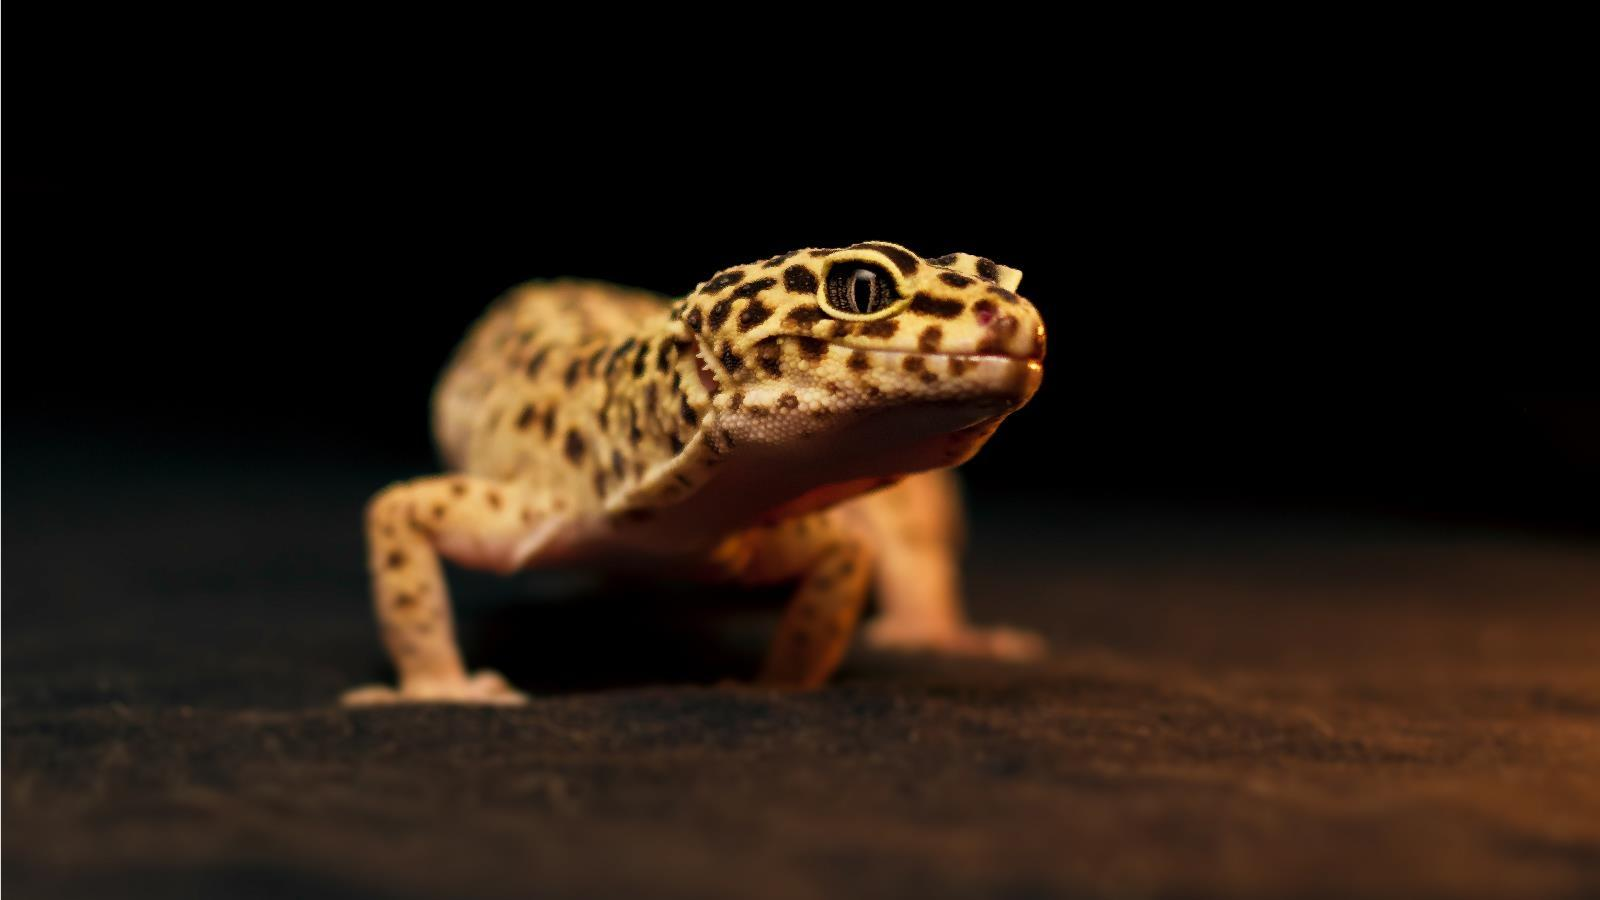 Satanic Iphone Wallpaper Leopard Gecko Wallpaper Hd Download